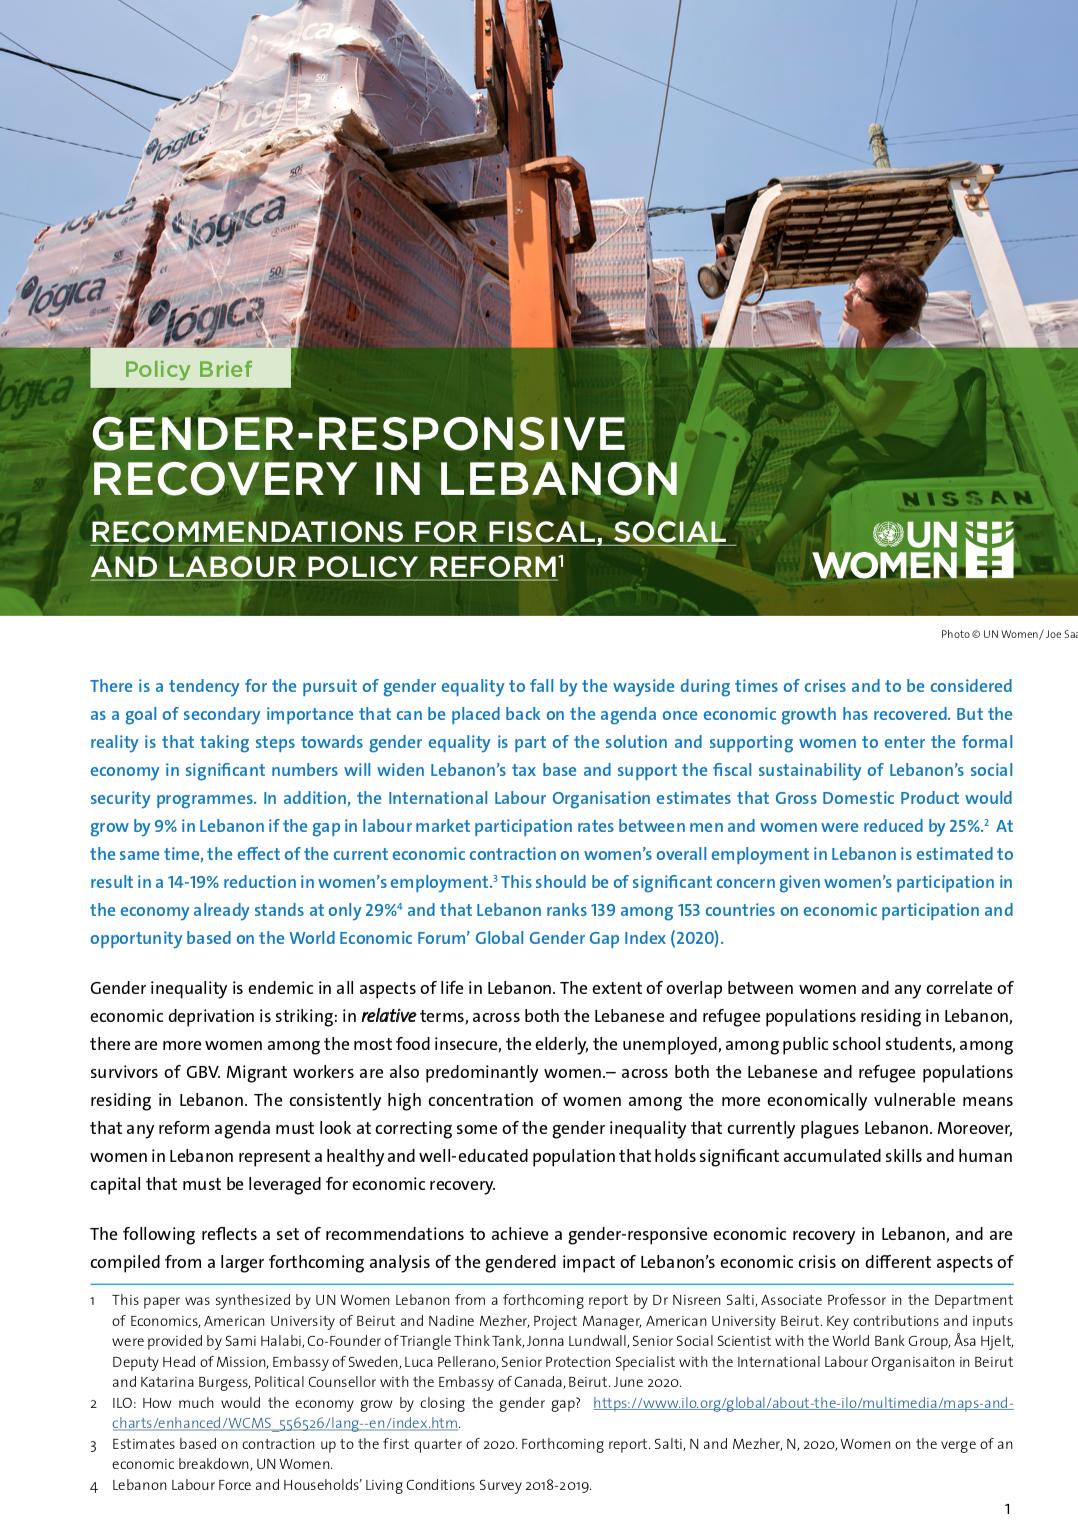 Gender-Responsive Recovery in Lebanon